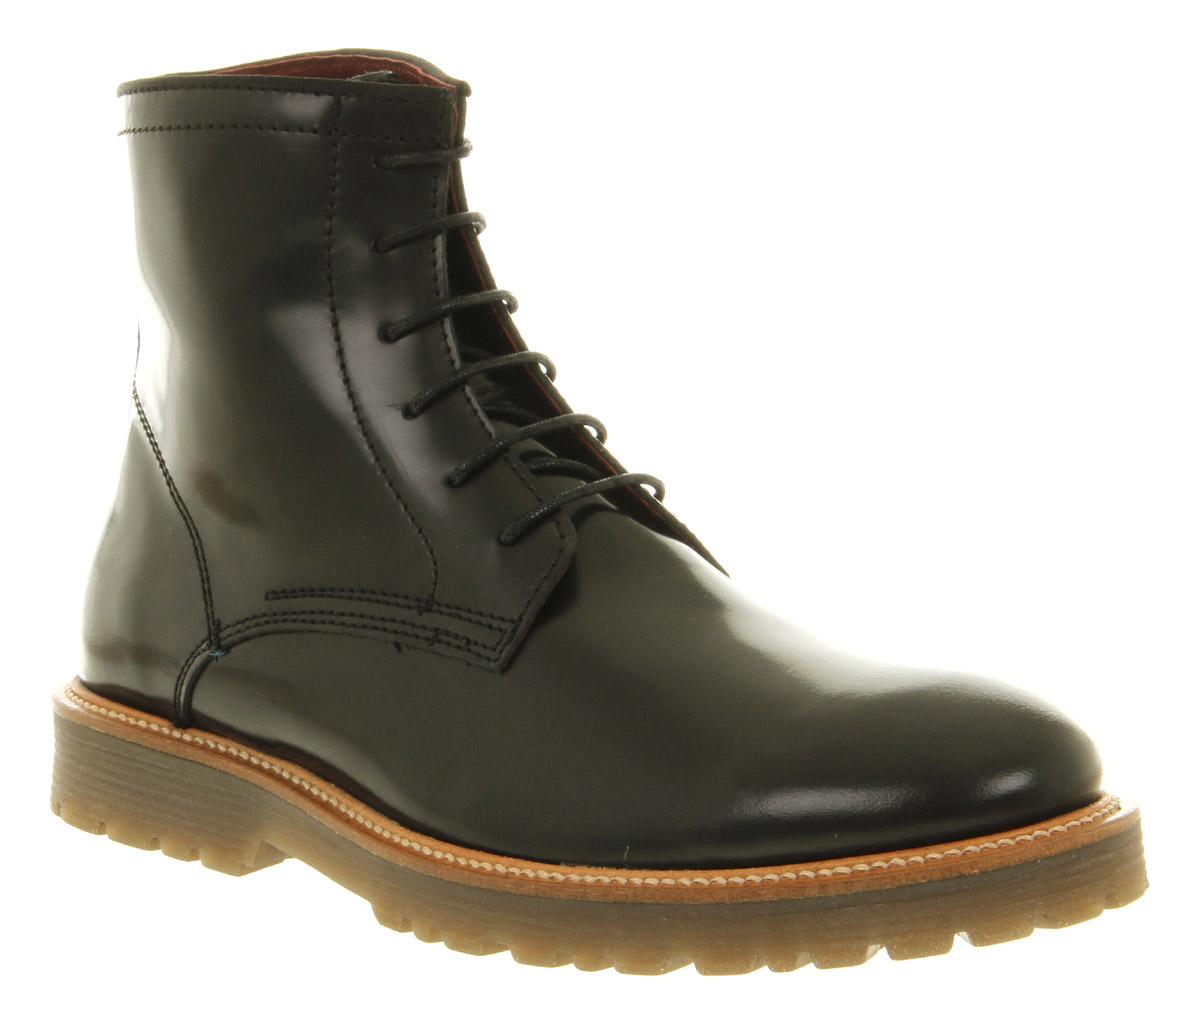 mens poste callum lace boot black hi shine leather boots